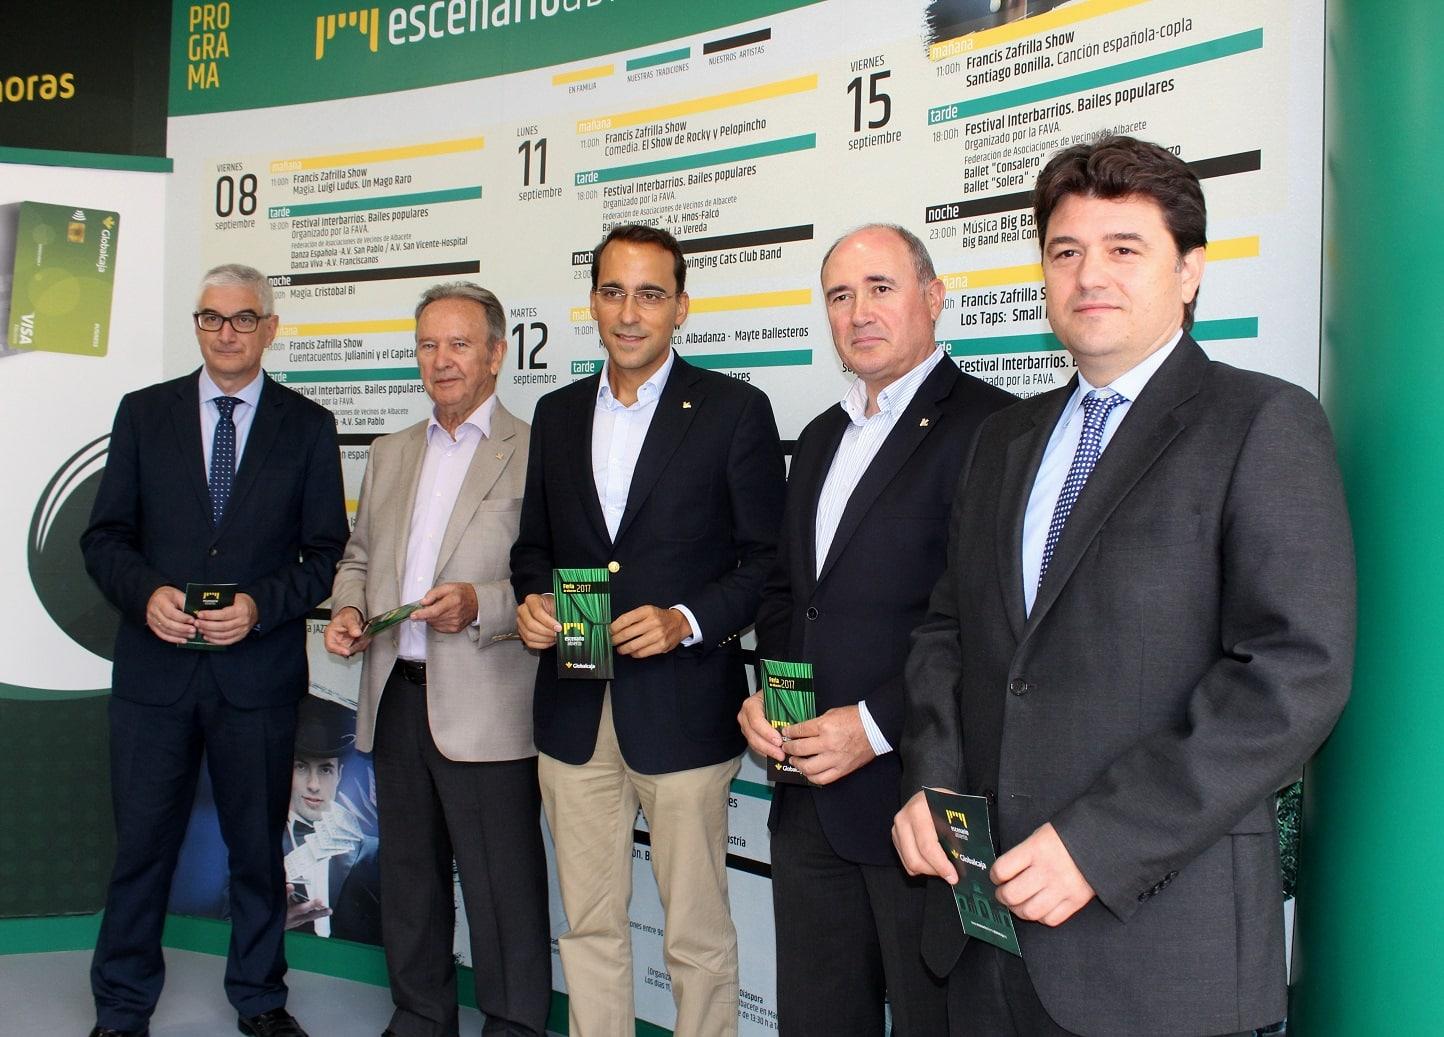 https://blog.globalcaja.es/wp-content/uploads/2017/09/Foto.Inauguración-del-stand-de-Globalcaja-en-el-Recinto-Ferial-3.jpg